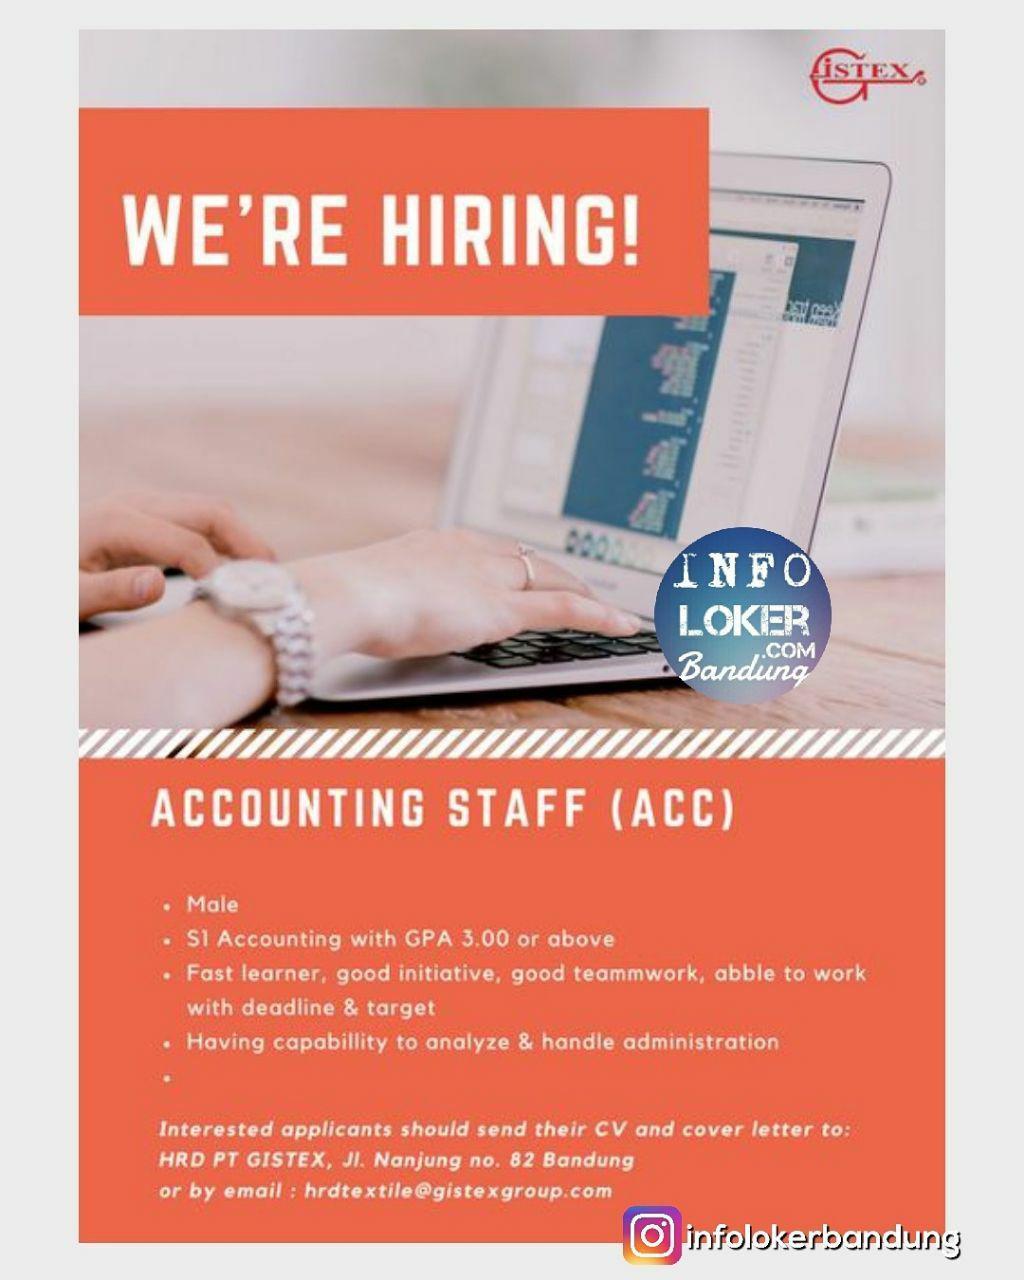 Lowongan Kerja Accounting PT. Gistex Bandung Januari 2018